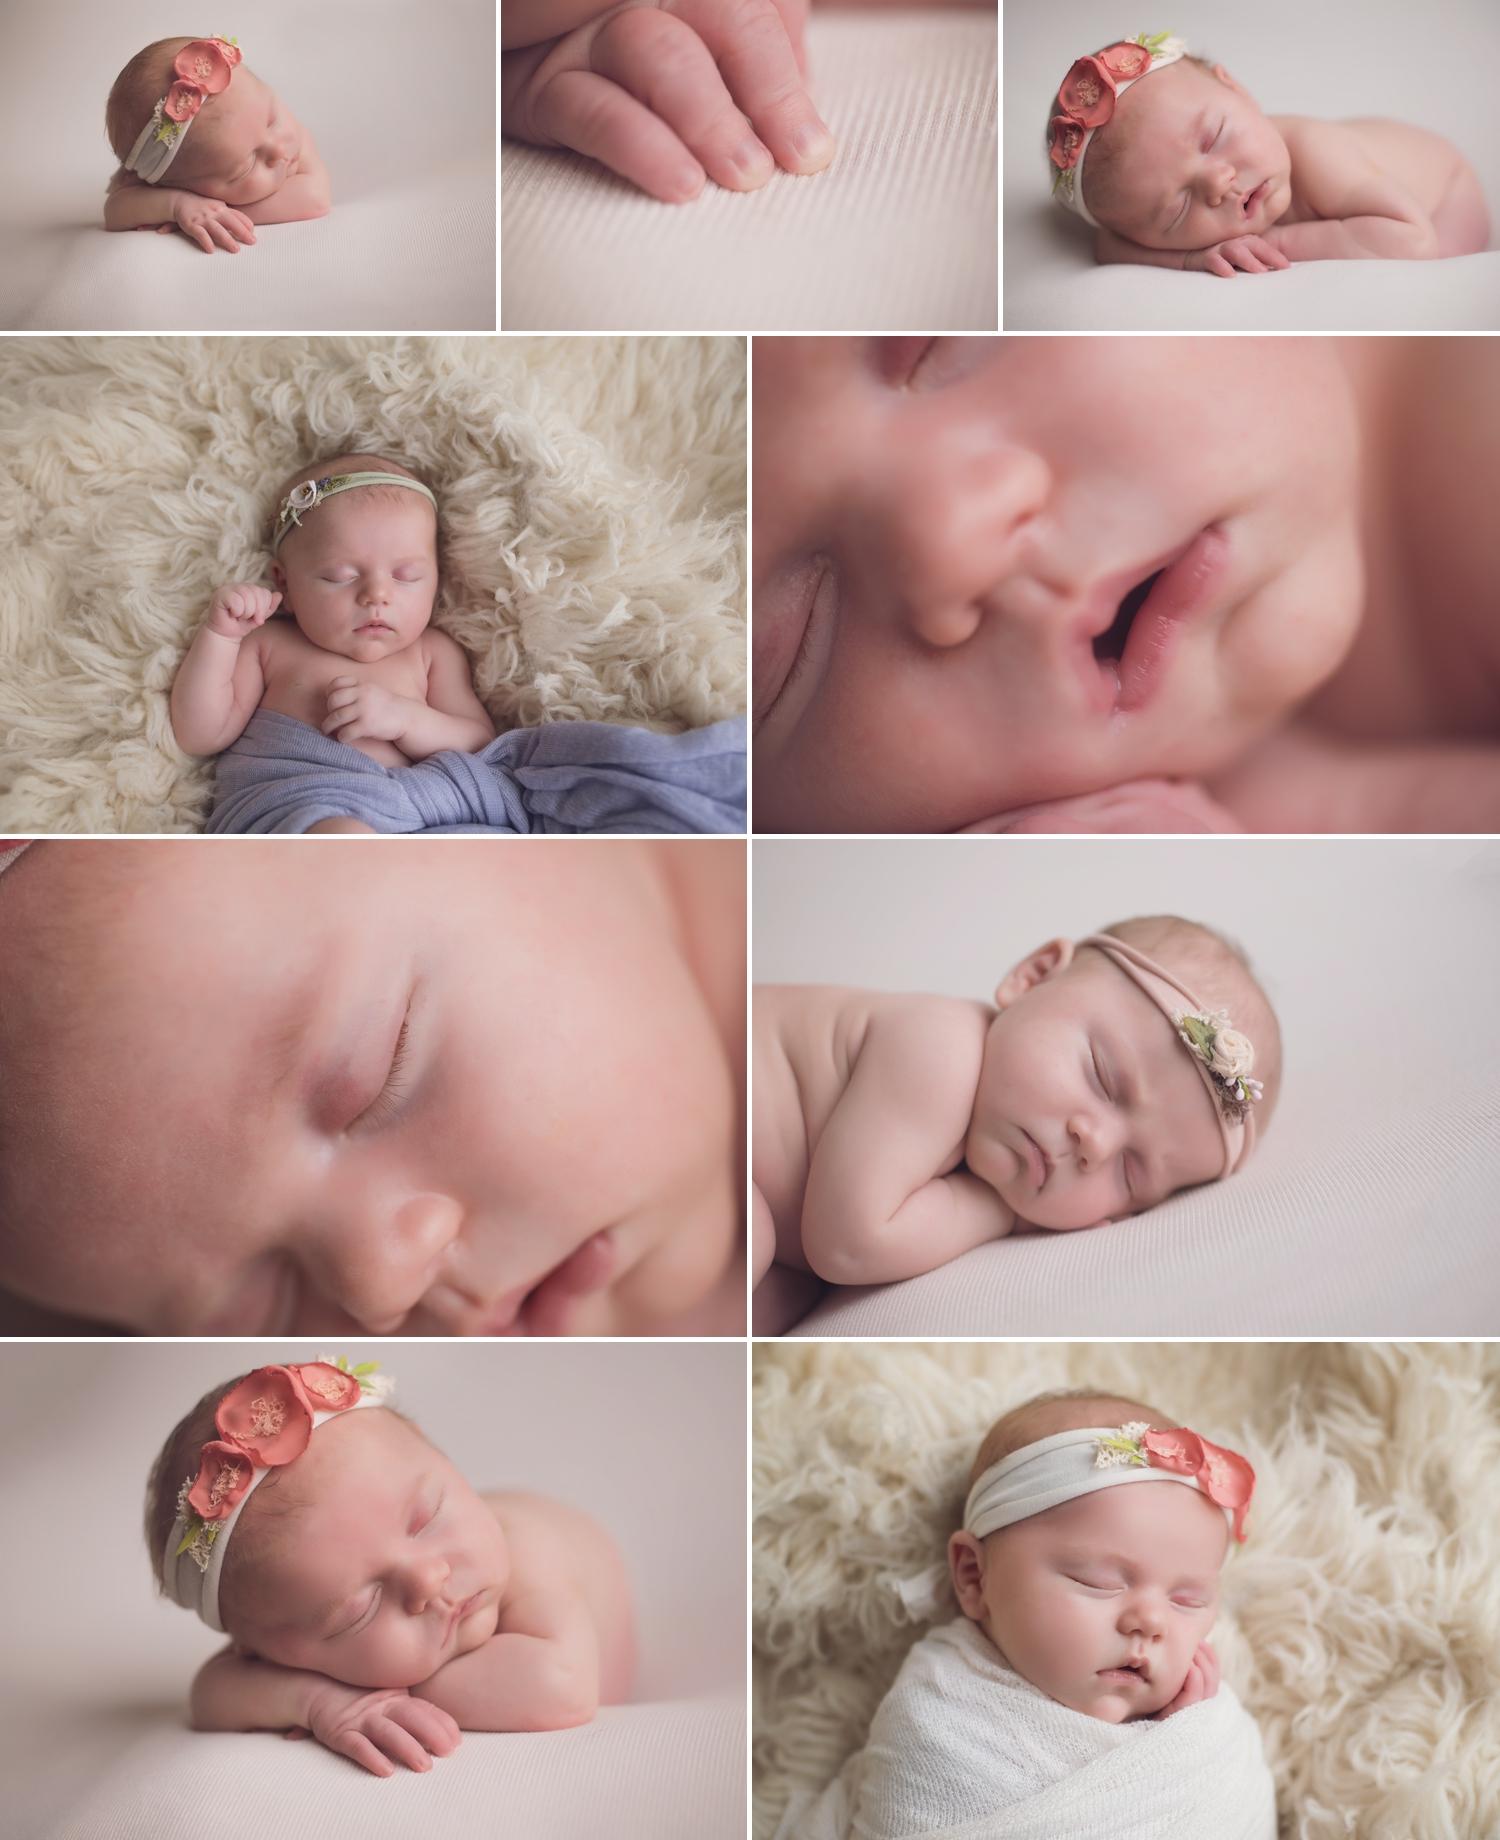 southwest-kansas-newborn-photography 2.jpg